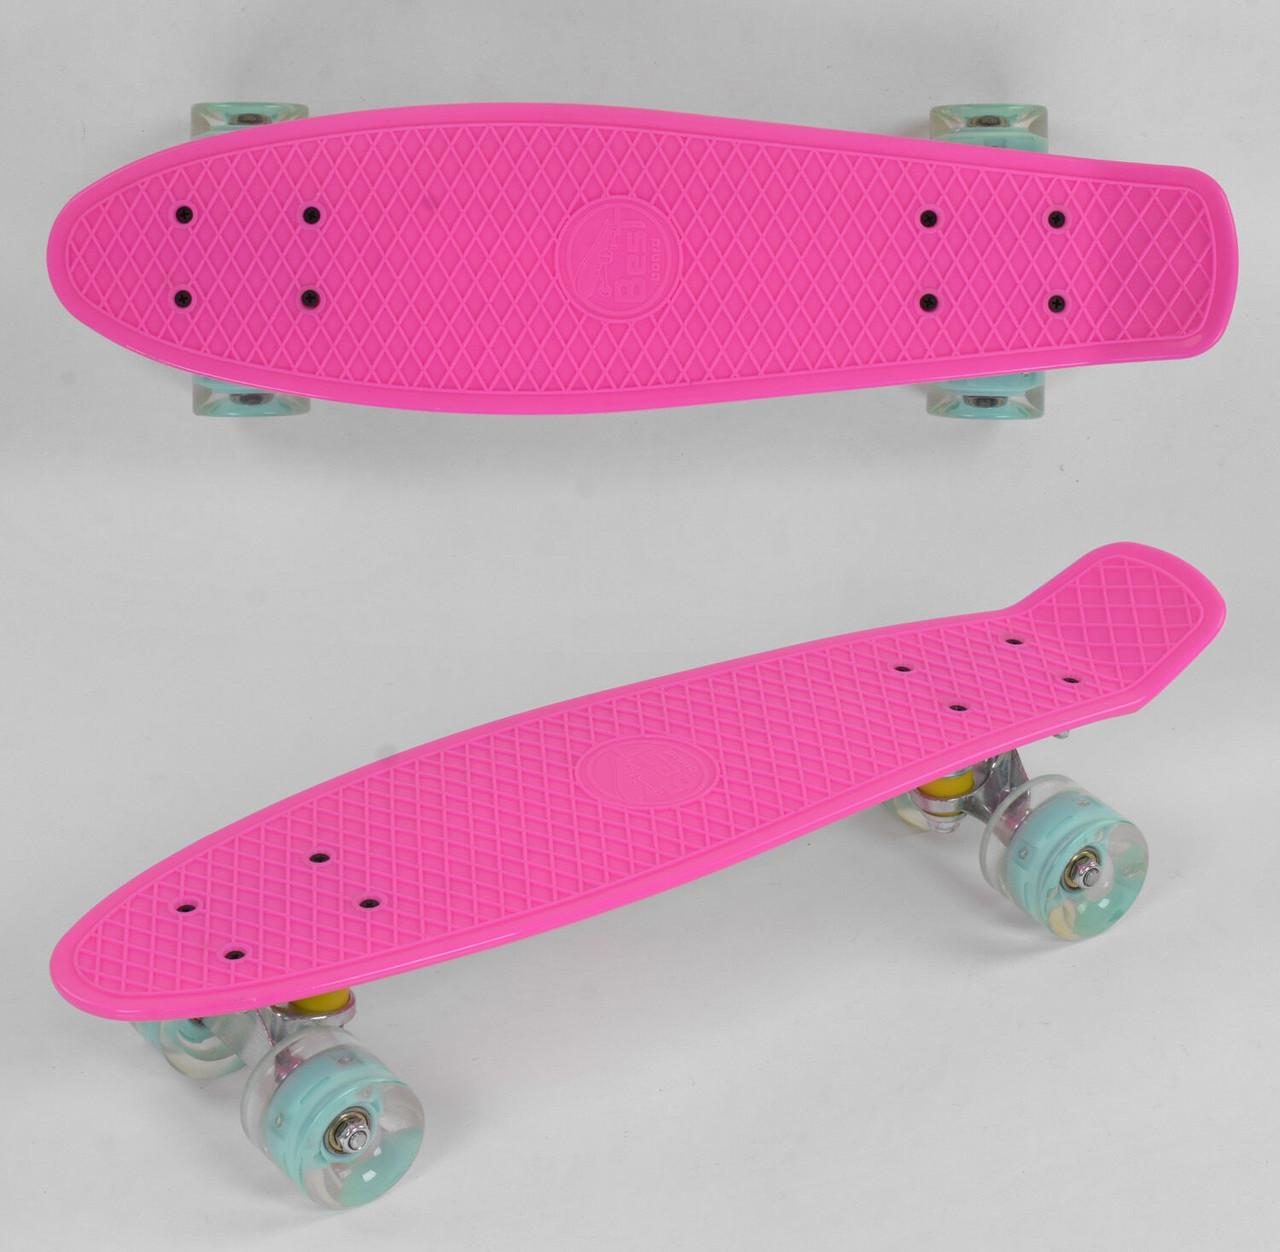 "Пенни борд скейт со светящимися колесами 22"" Best Board 1070 розовый"